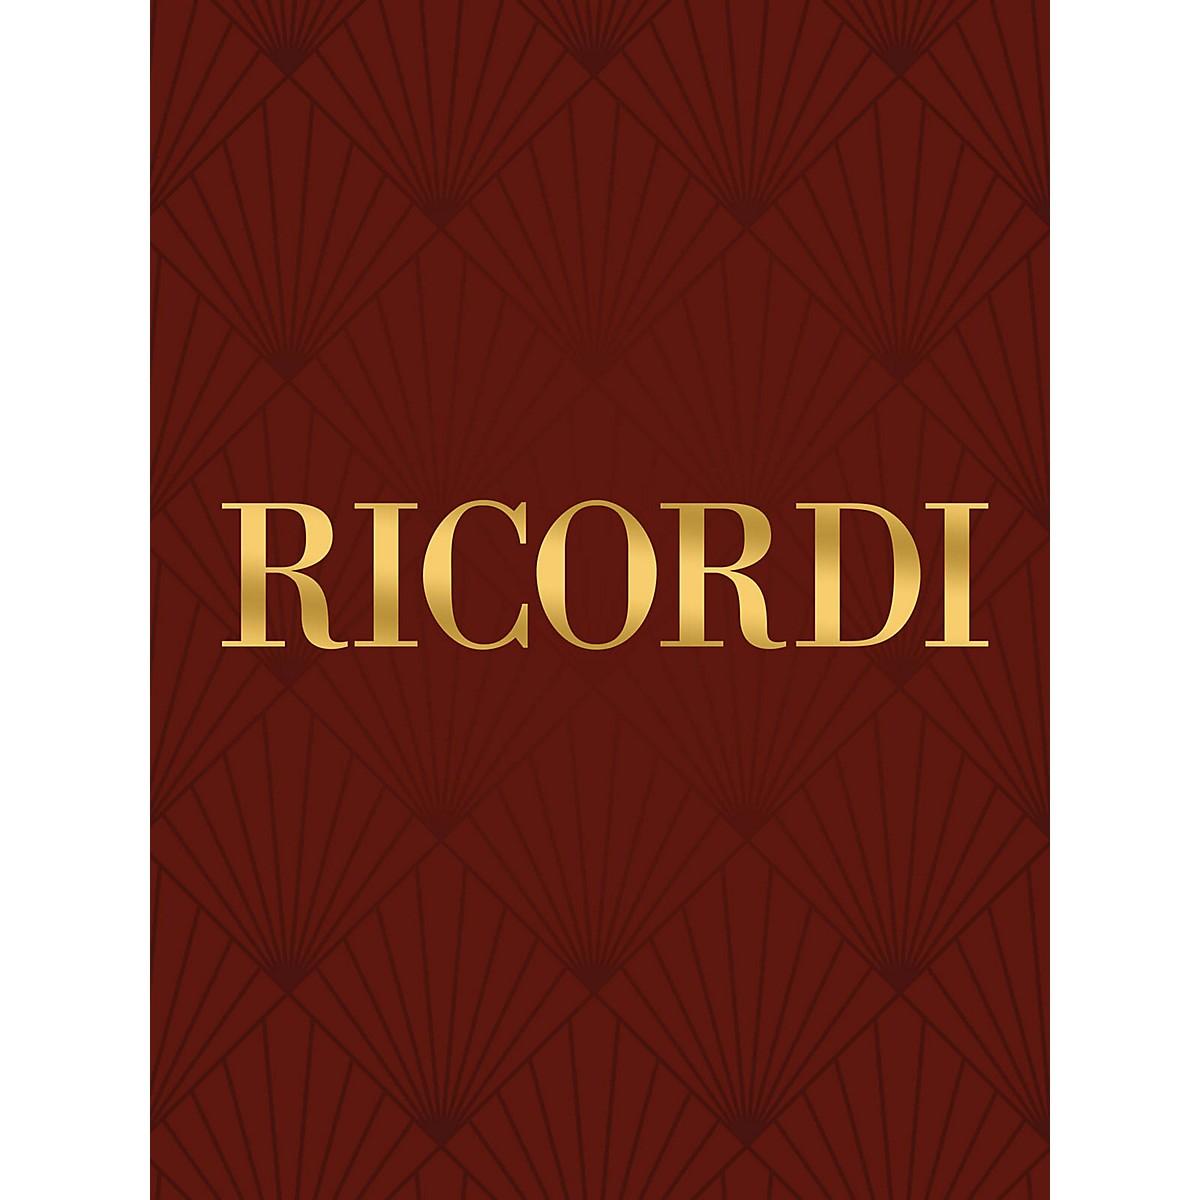 Ricordi Gradus Ad Parnassum Volume 3 Piano Large Works Series Composed by Muzio Clementi Edited by S. Cesi